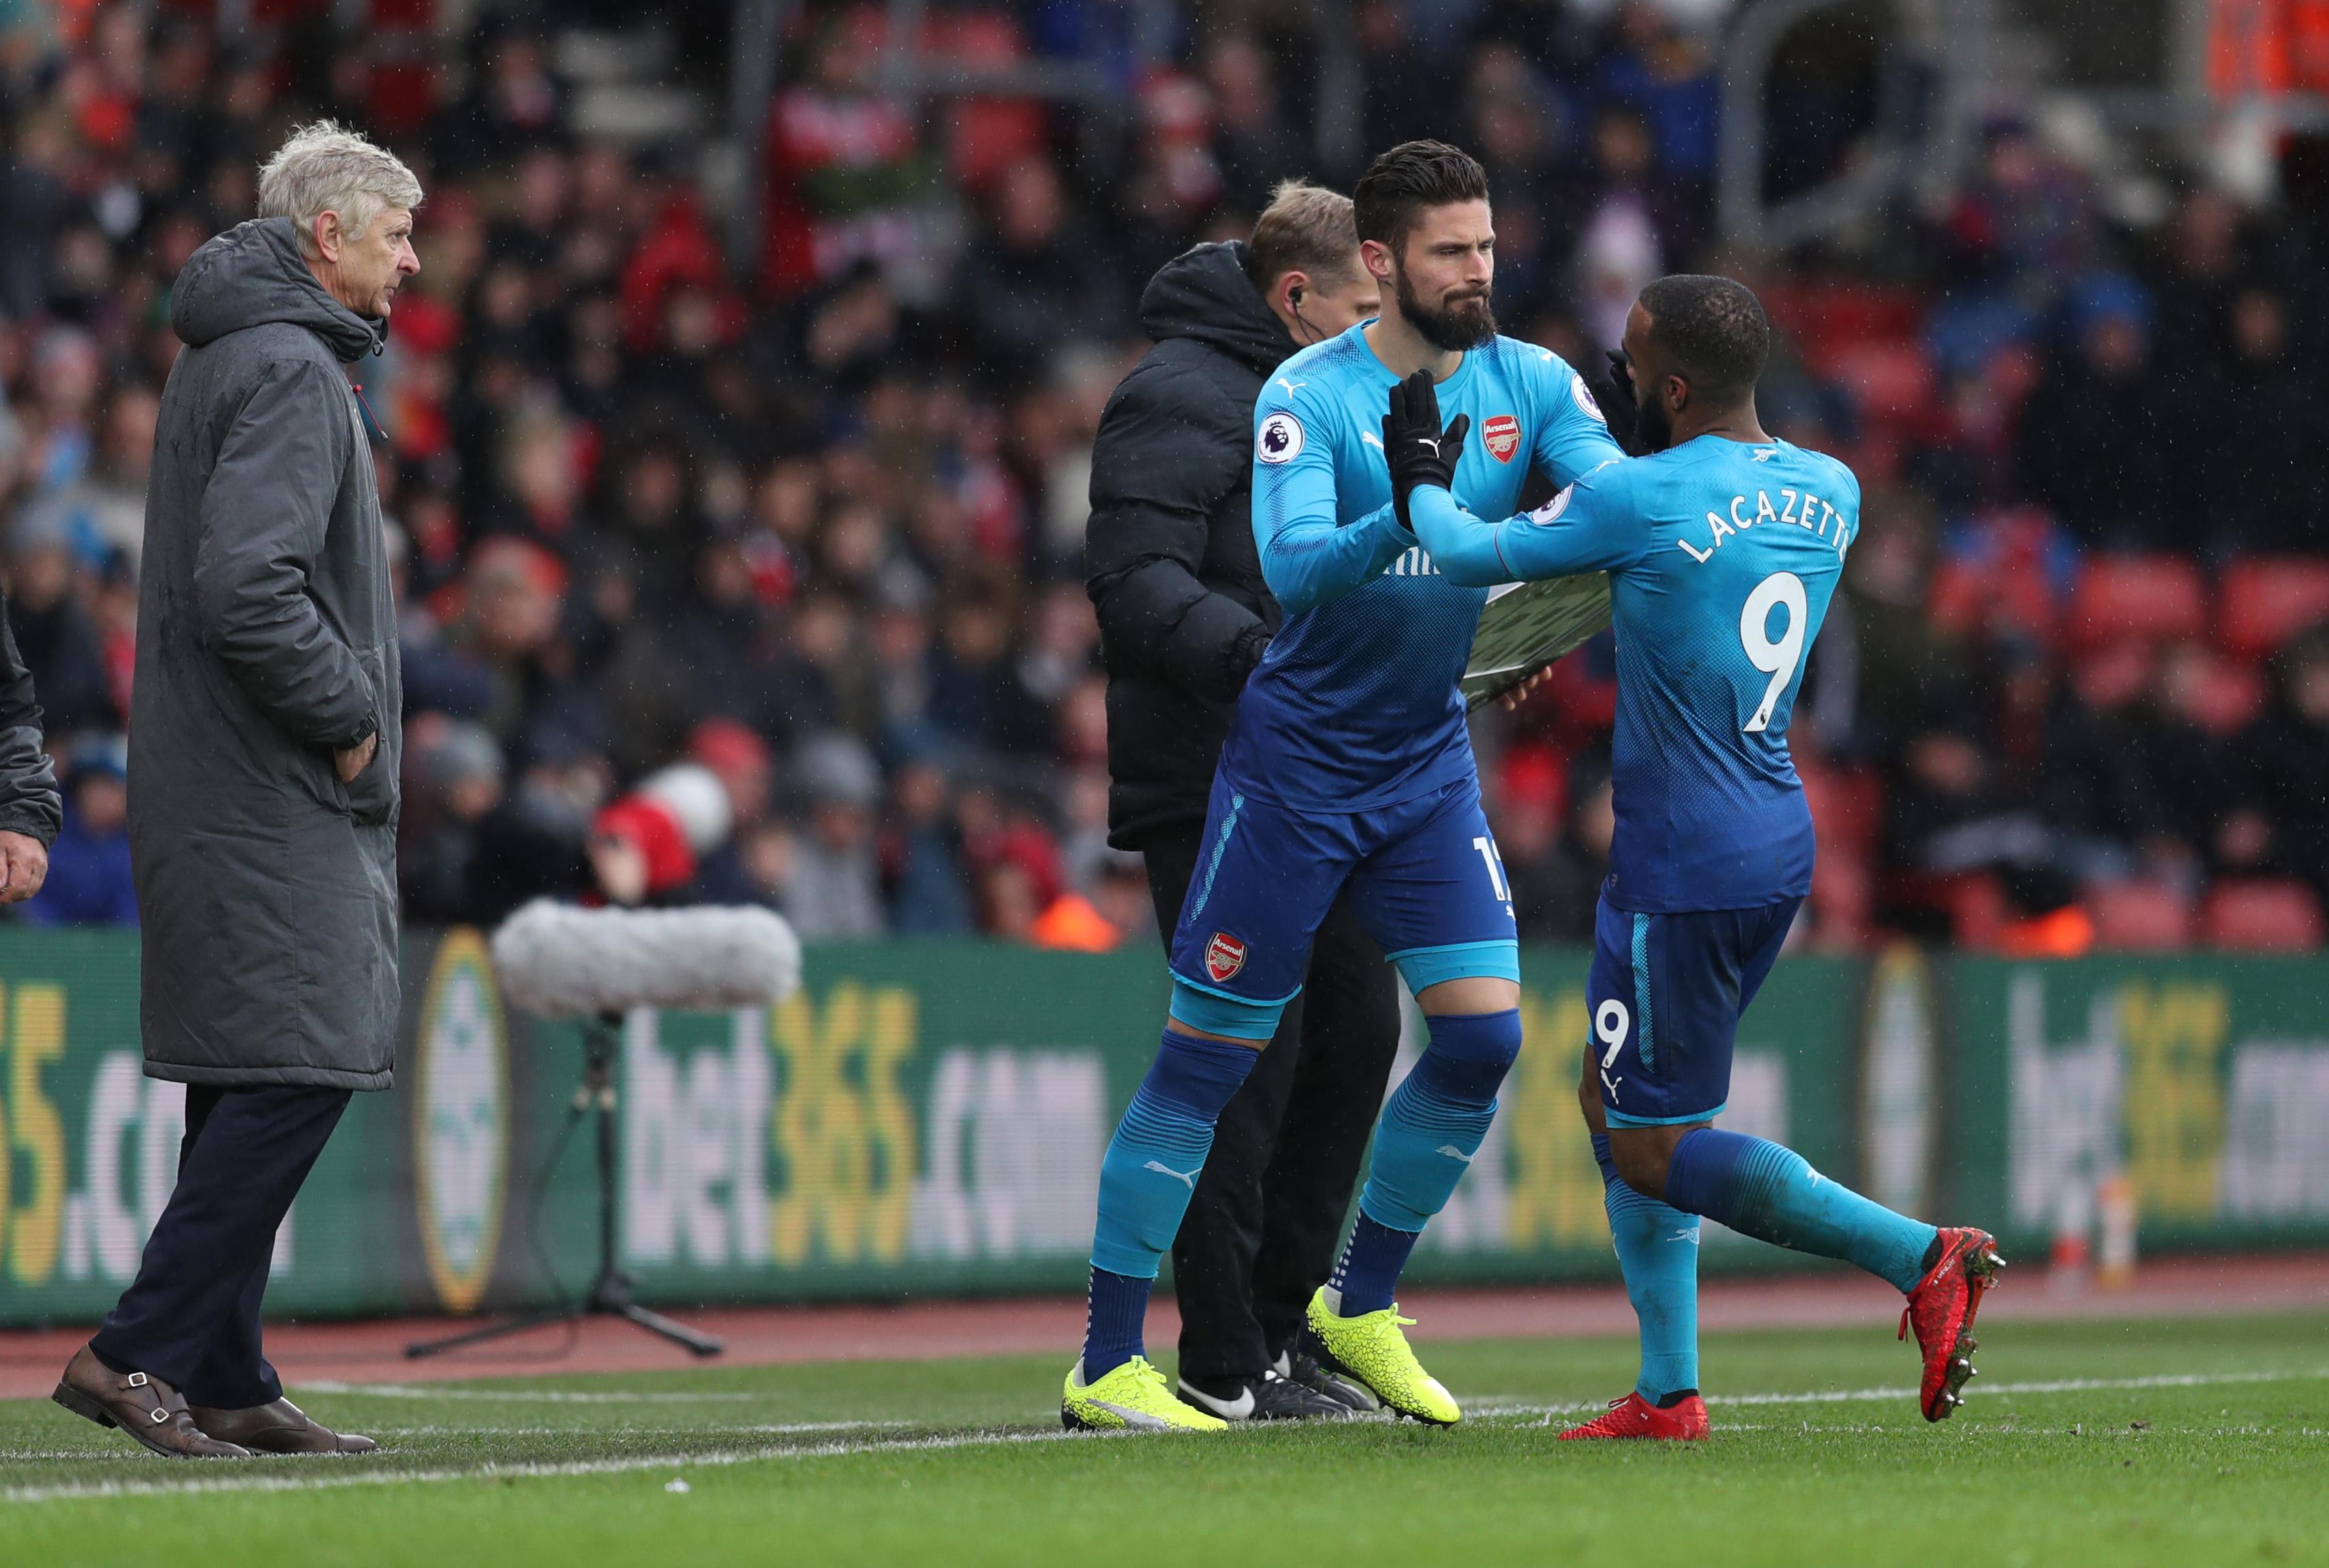 Wenger sidesteps title talk but 'won't give up'